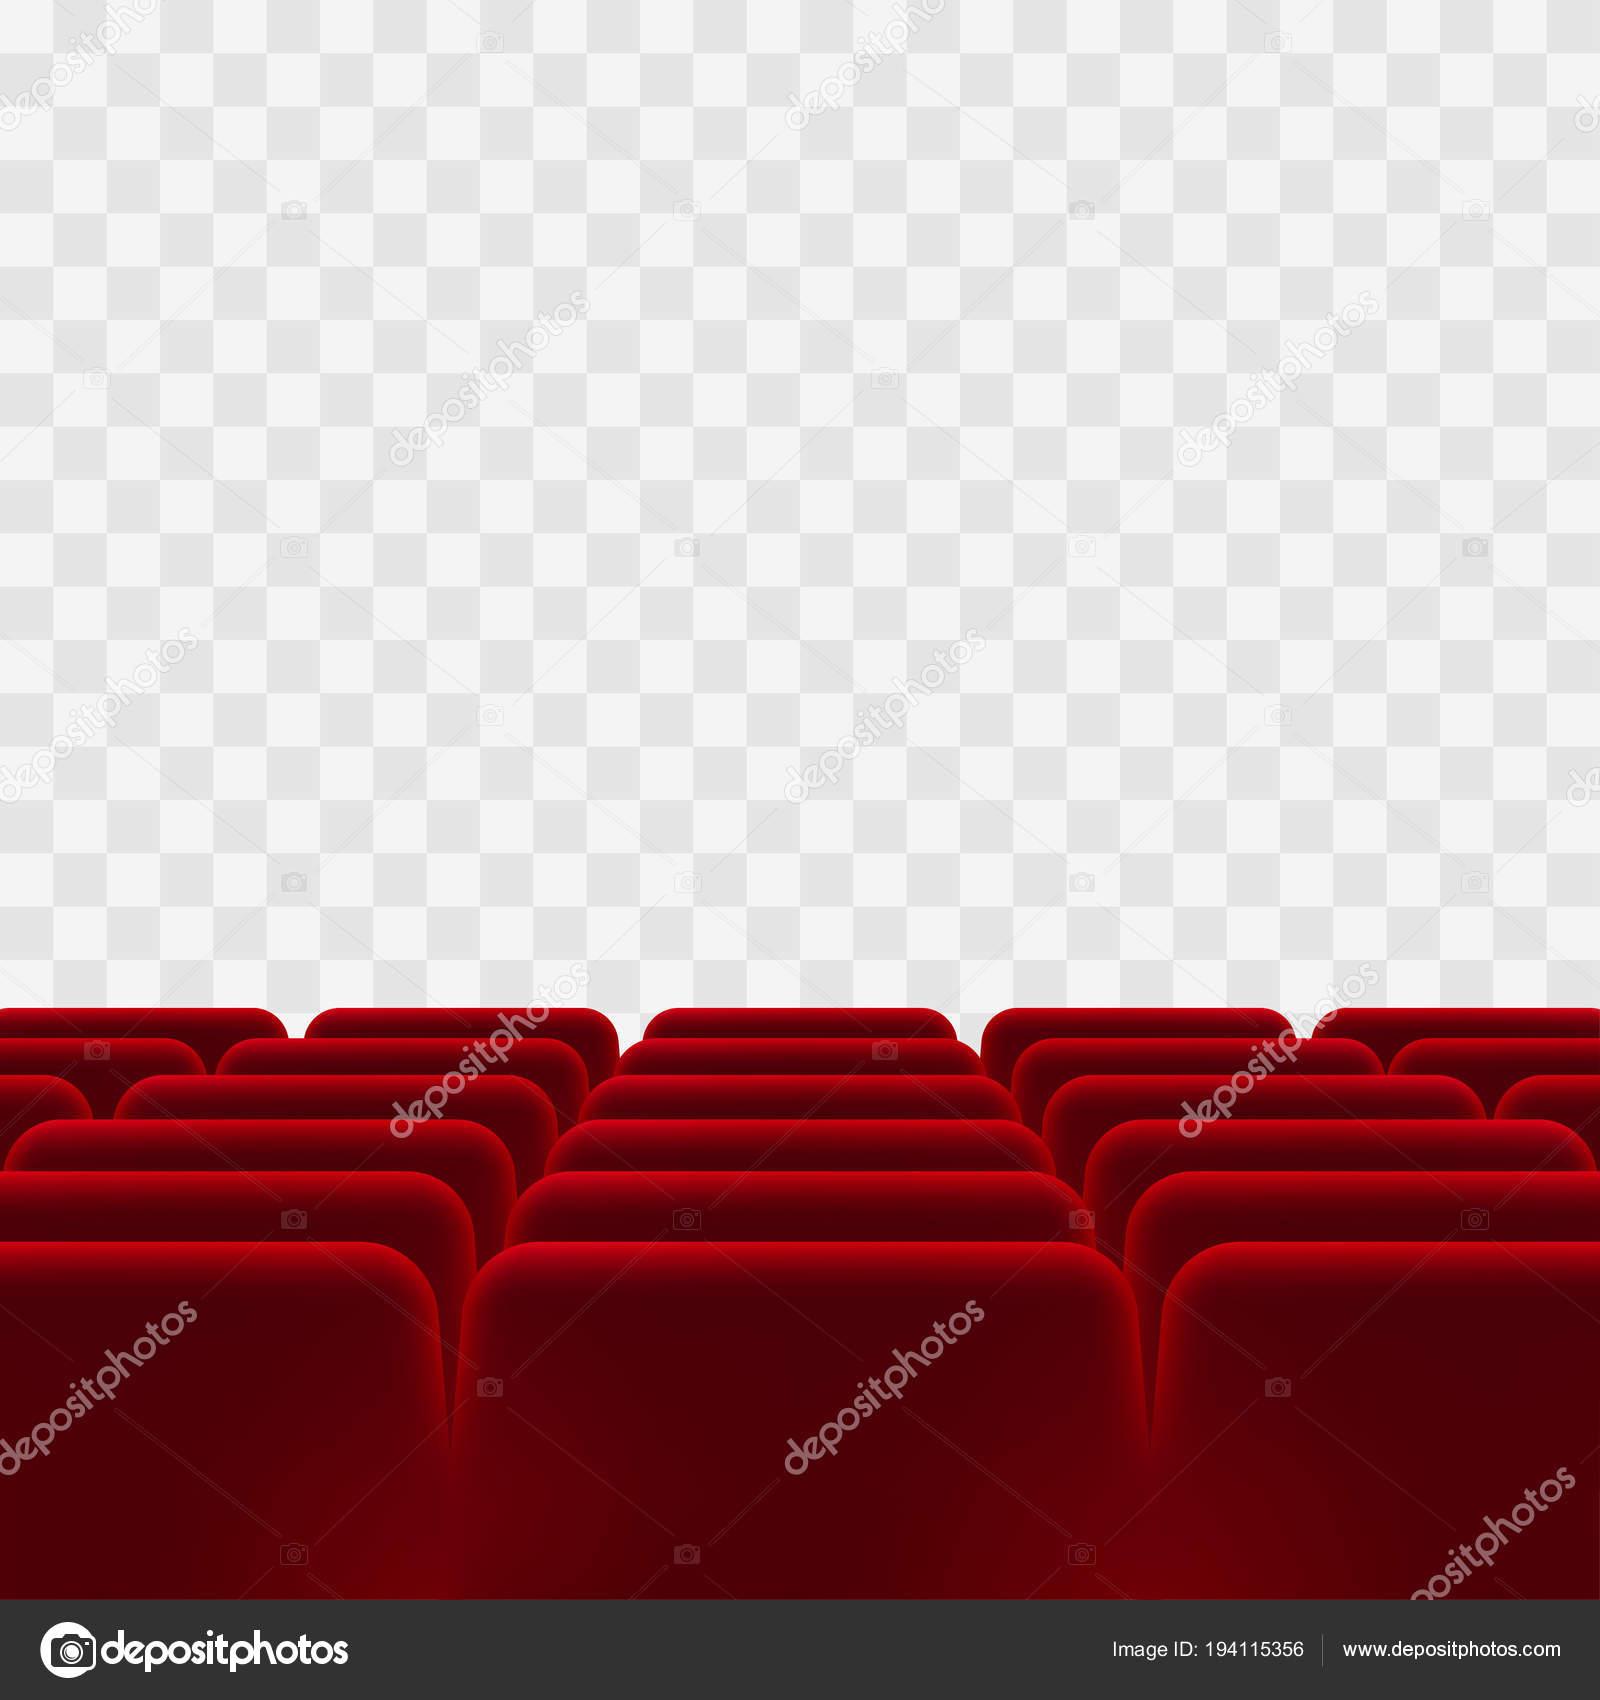 Sedie Rosse Trasparenti.Sedie Rosse Nel Cinema Con Sfondo Trasparente Vettoriali